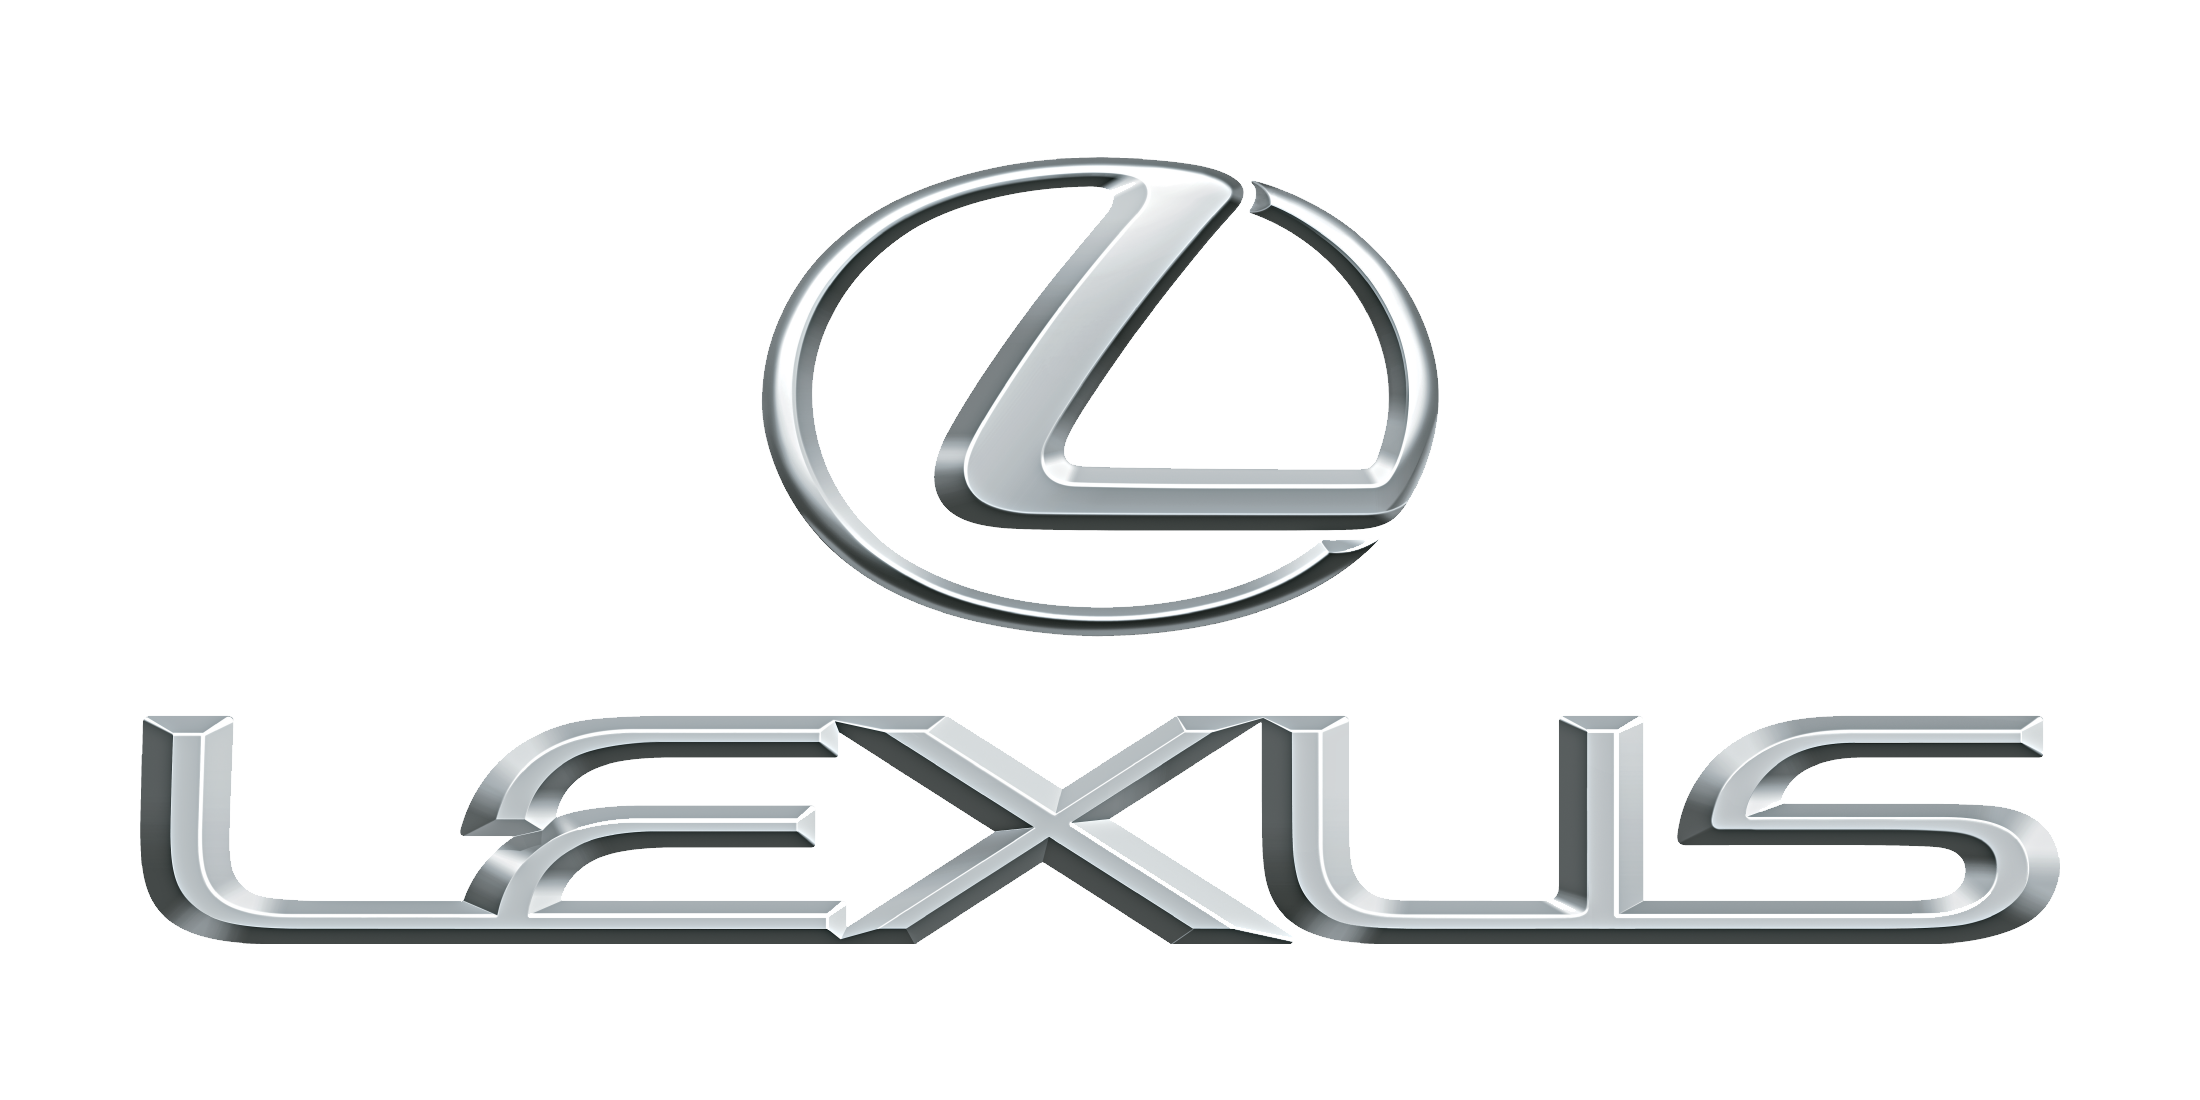 Lexus Car Logo Png Image Purepng Free Transparent Cc0 Png Image